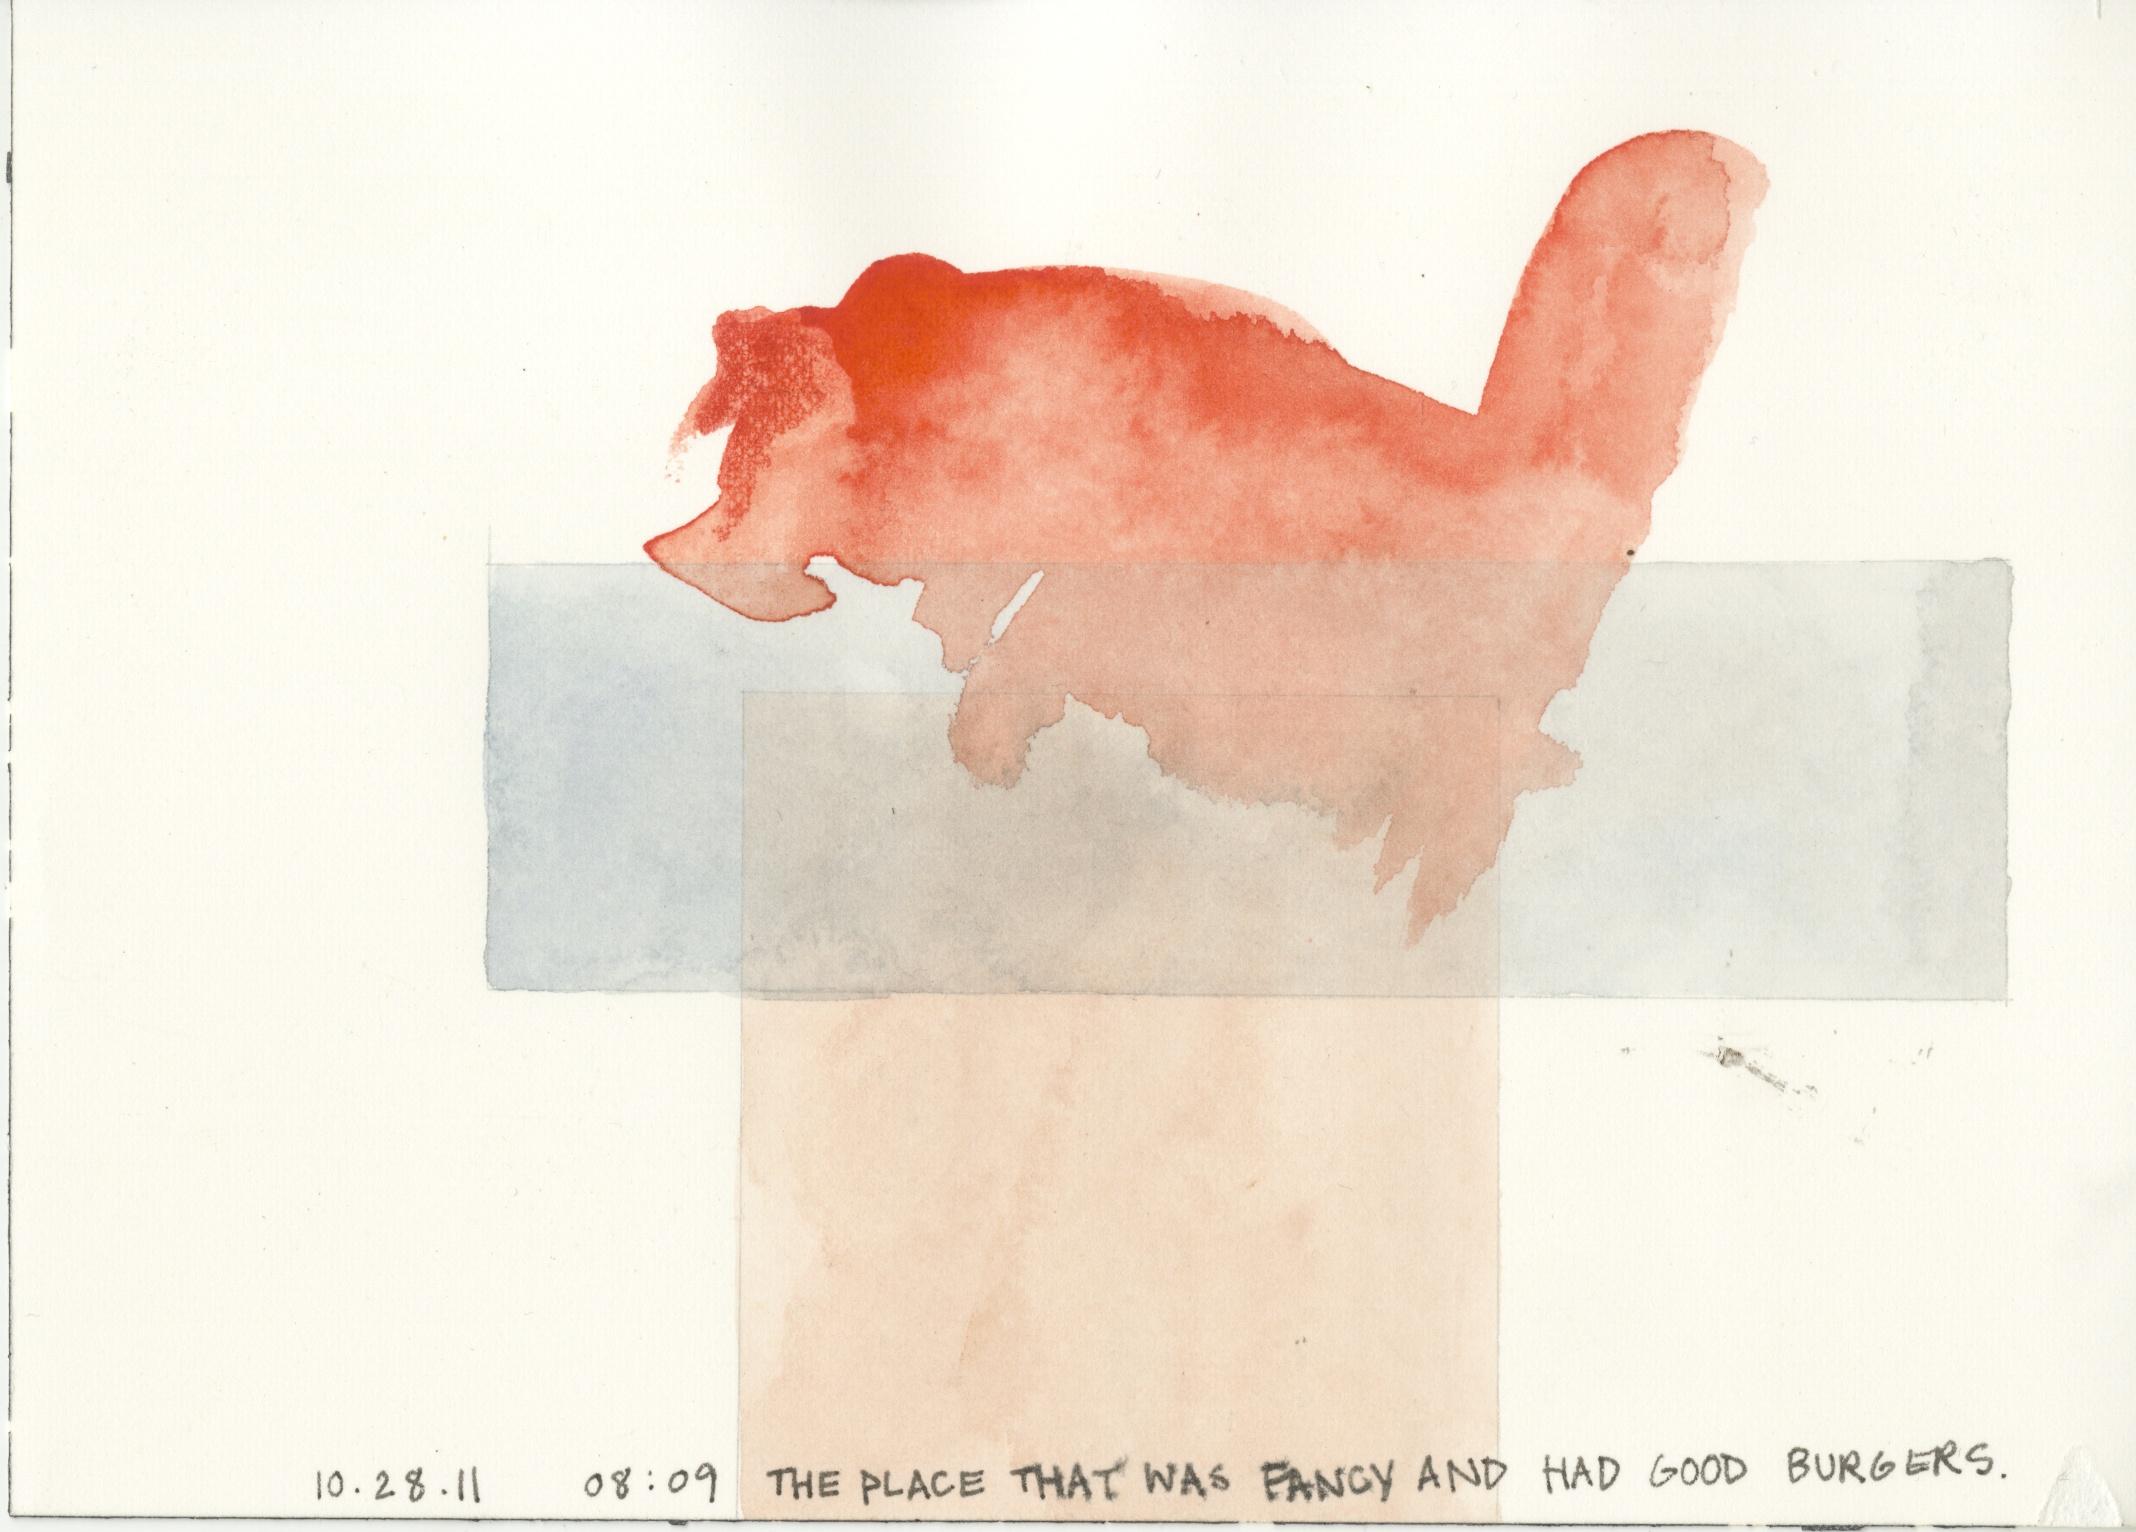 2011-10-28 drawing 7.jpg